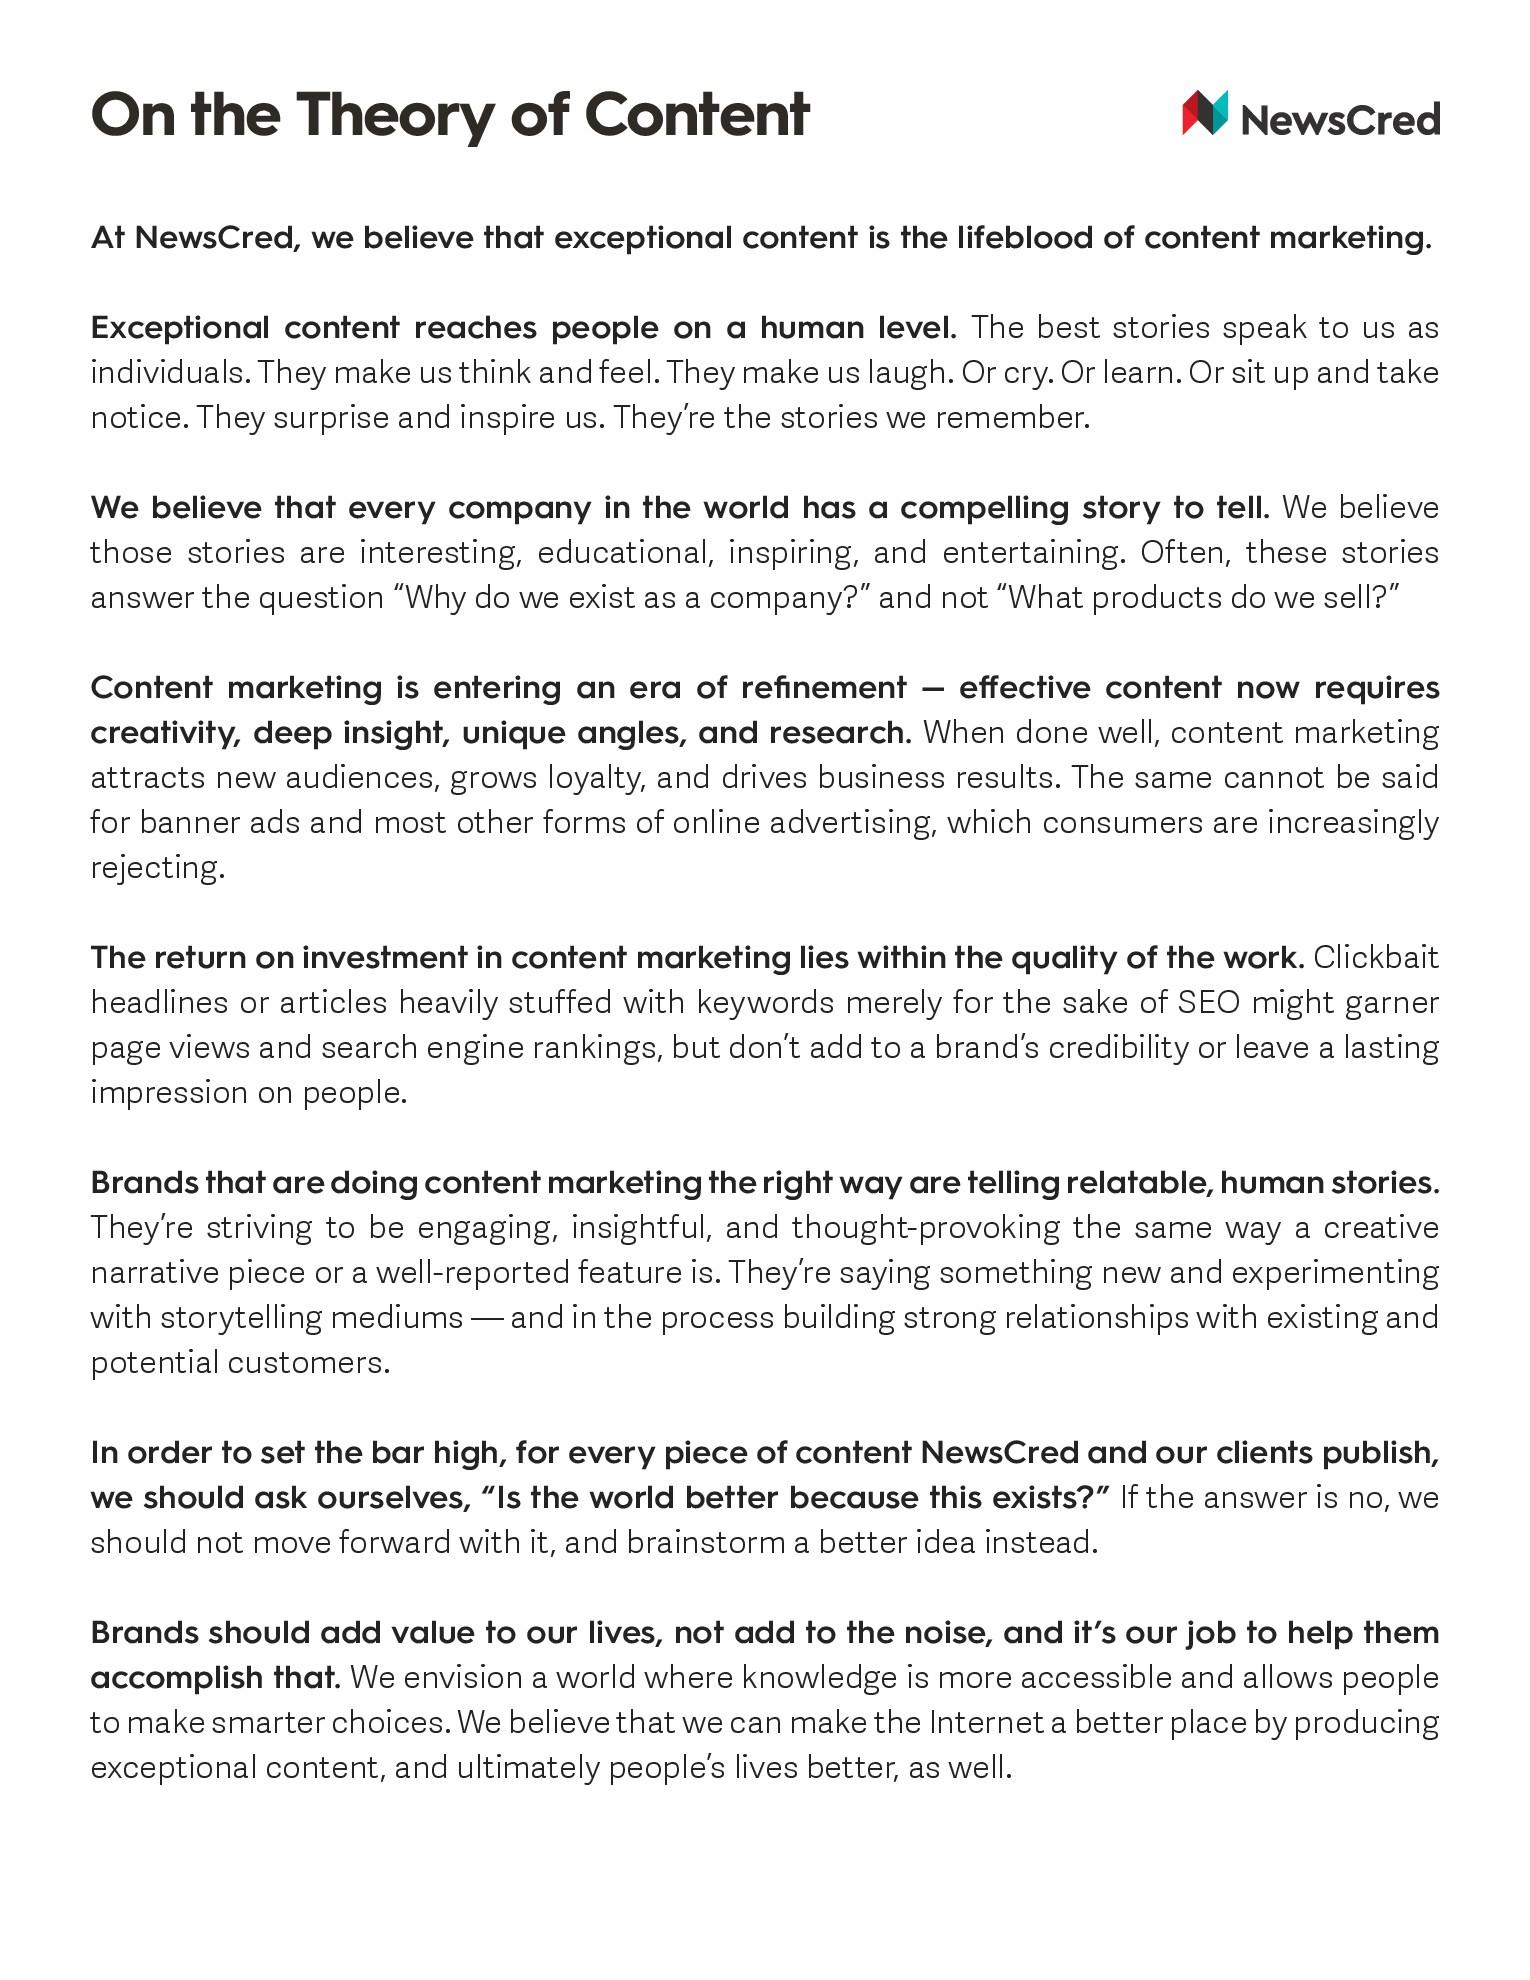 NewsCred Content Manifesto_1.jpg